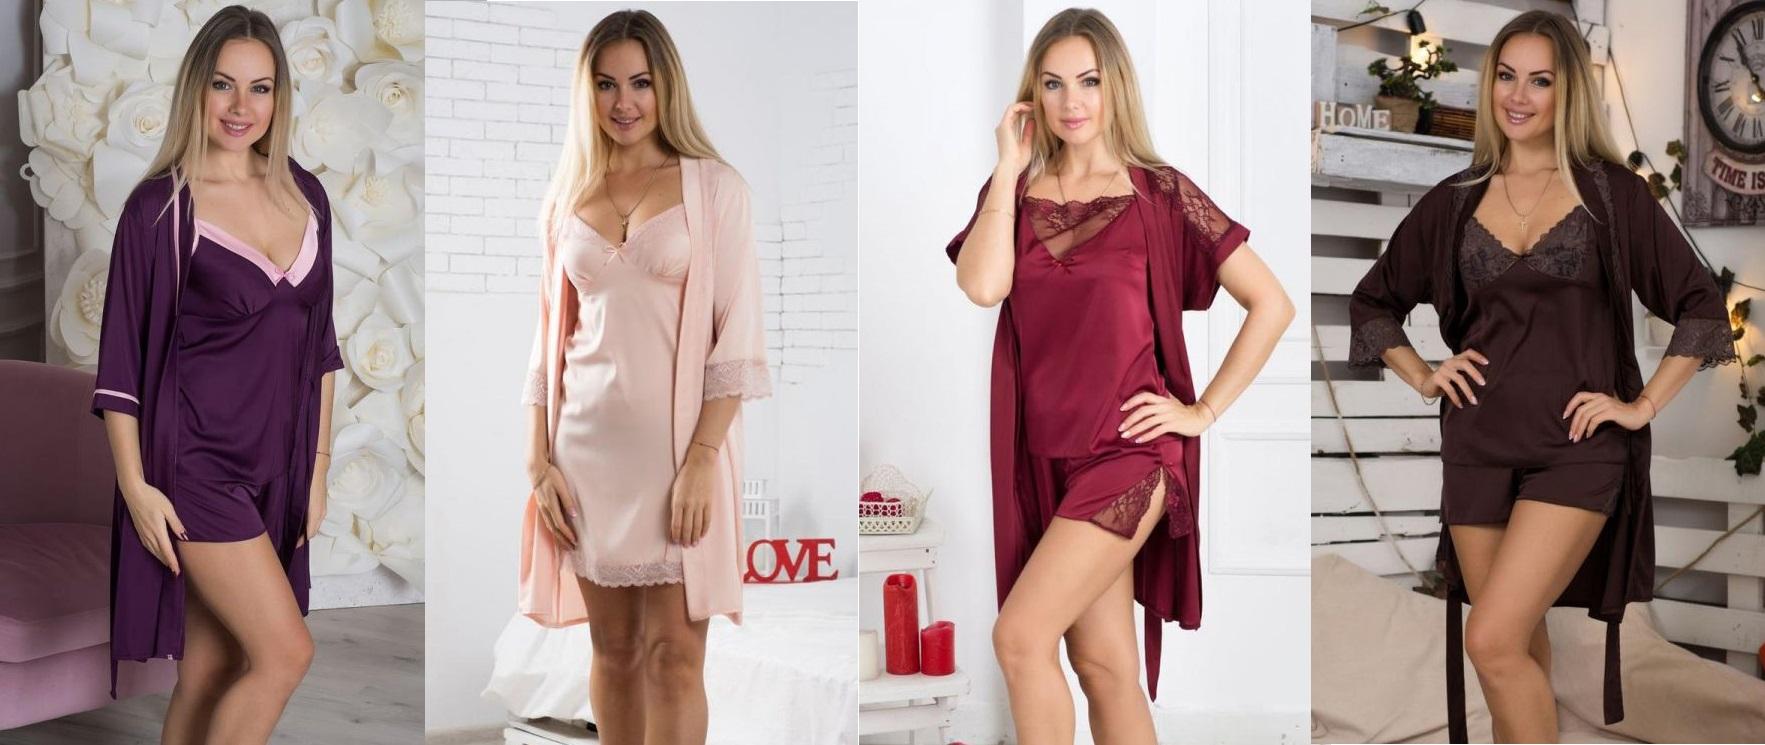 MiaNaGreen комплекты халат пижама сорочка купить